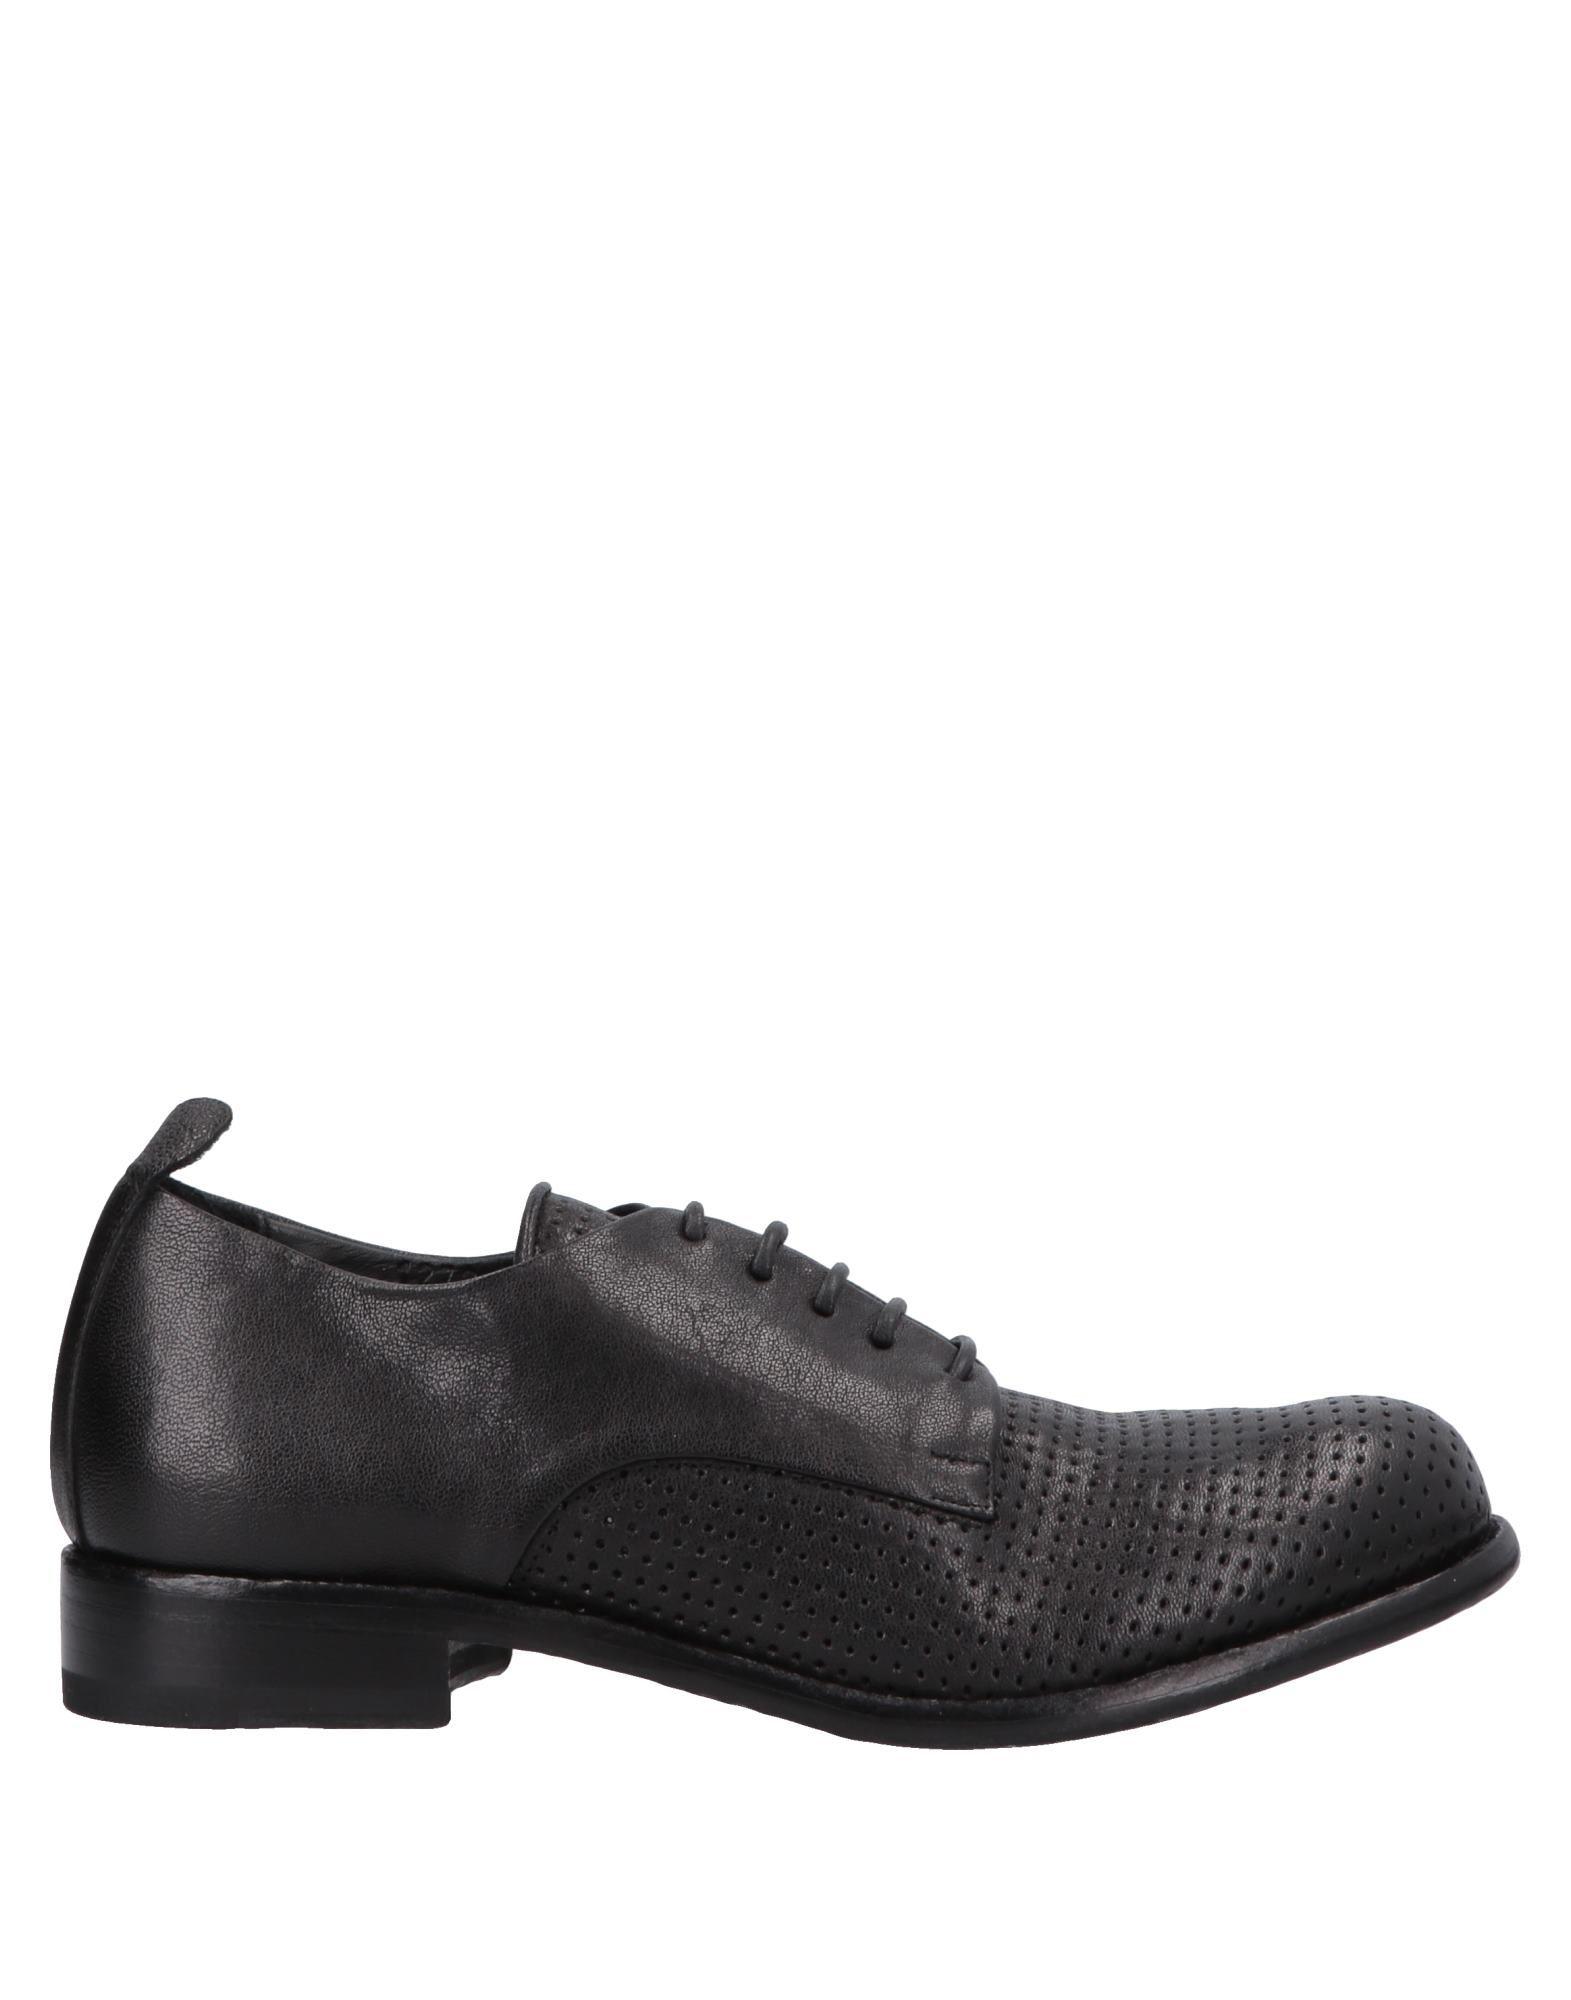 Фото - ERNESTO DOLANI Обувь на шнурках обувь на высокой платформе dkny